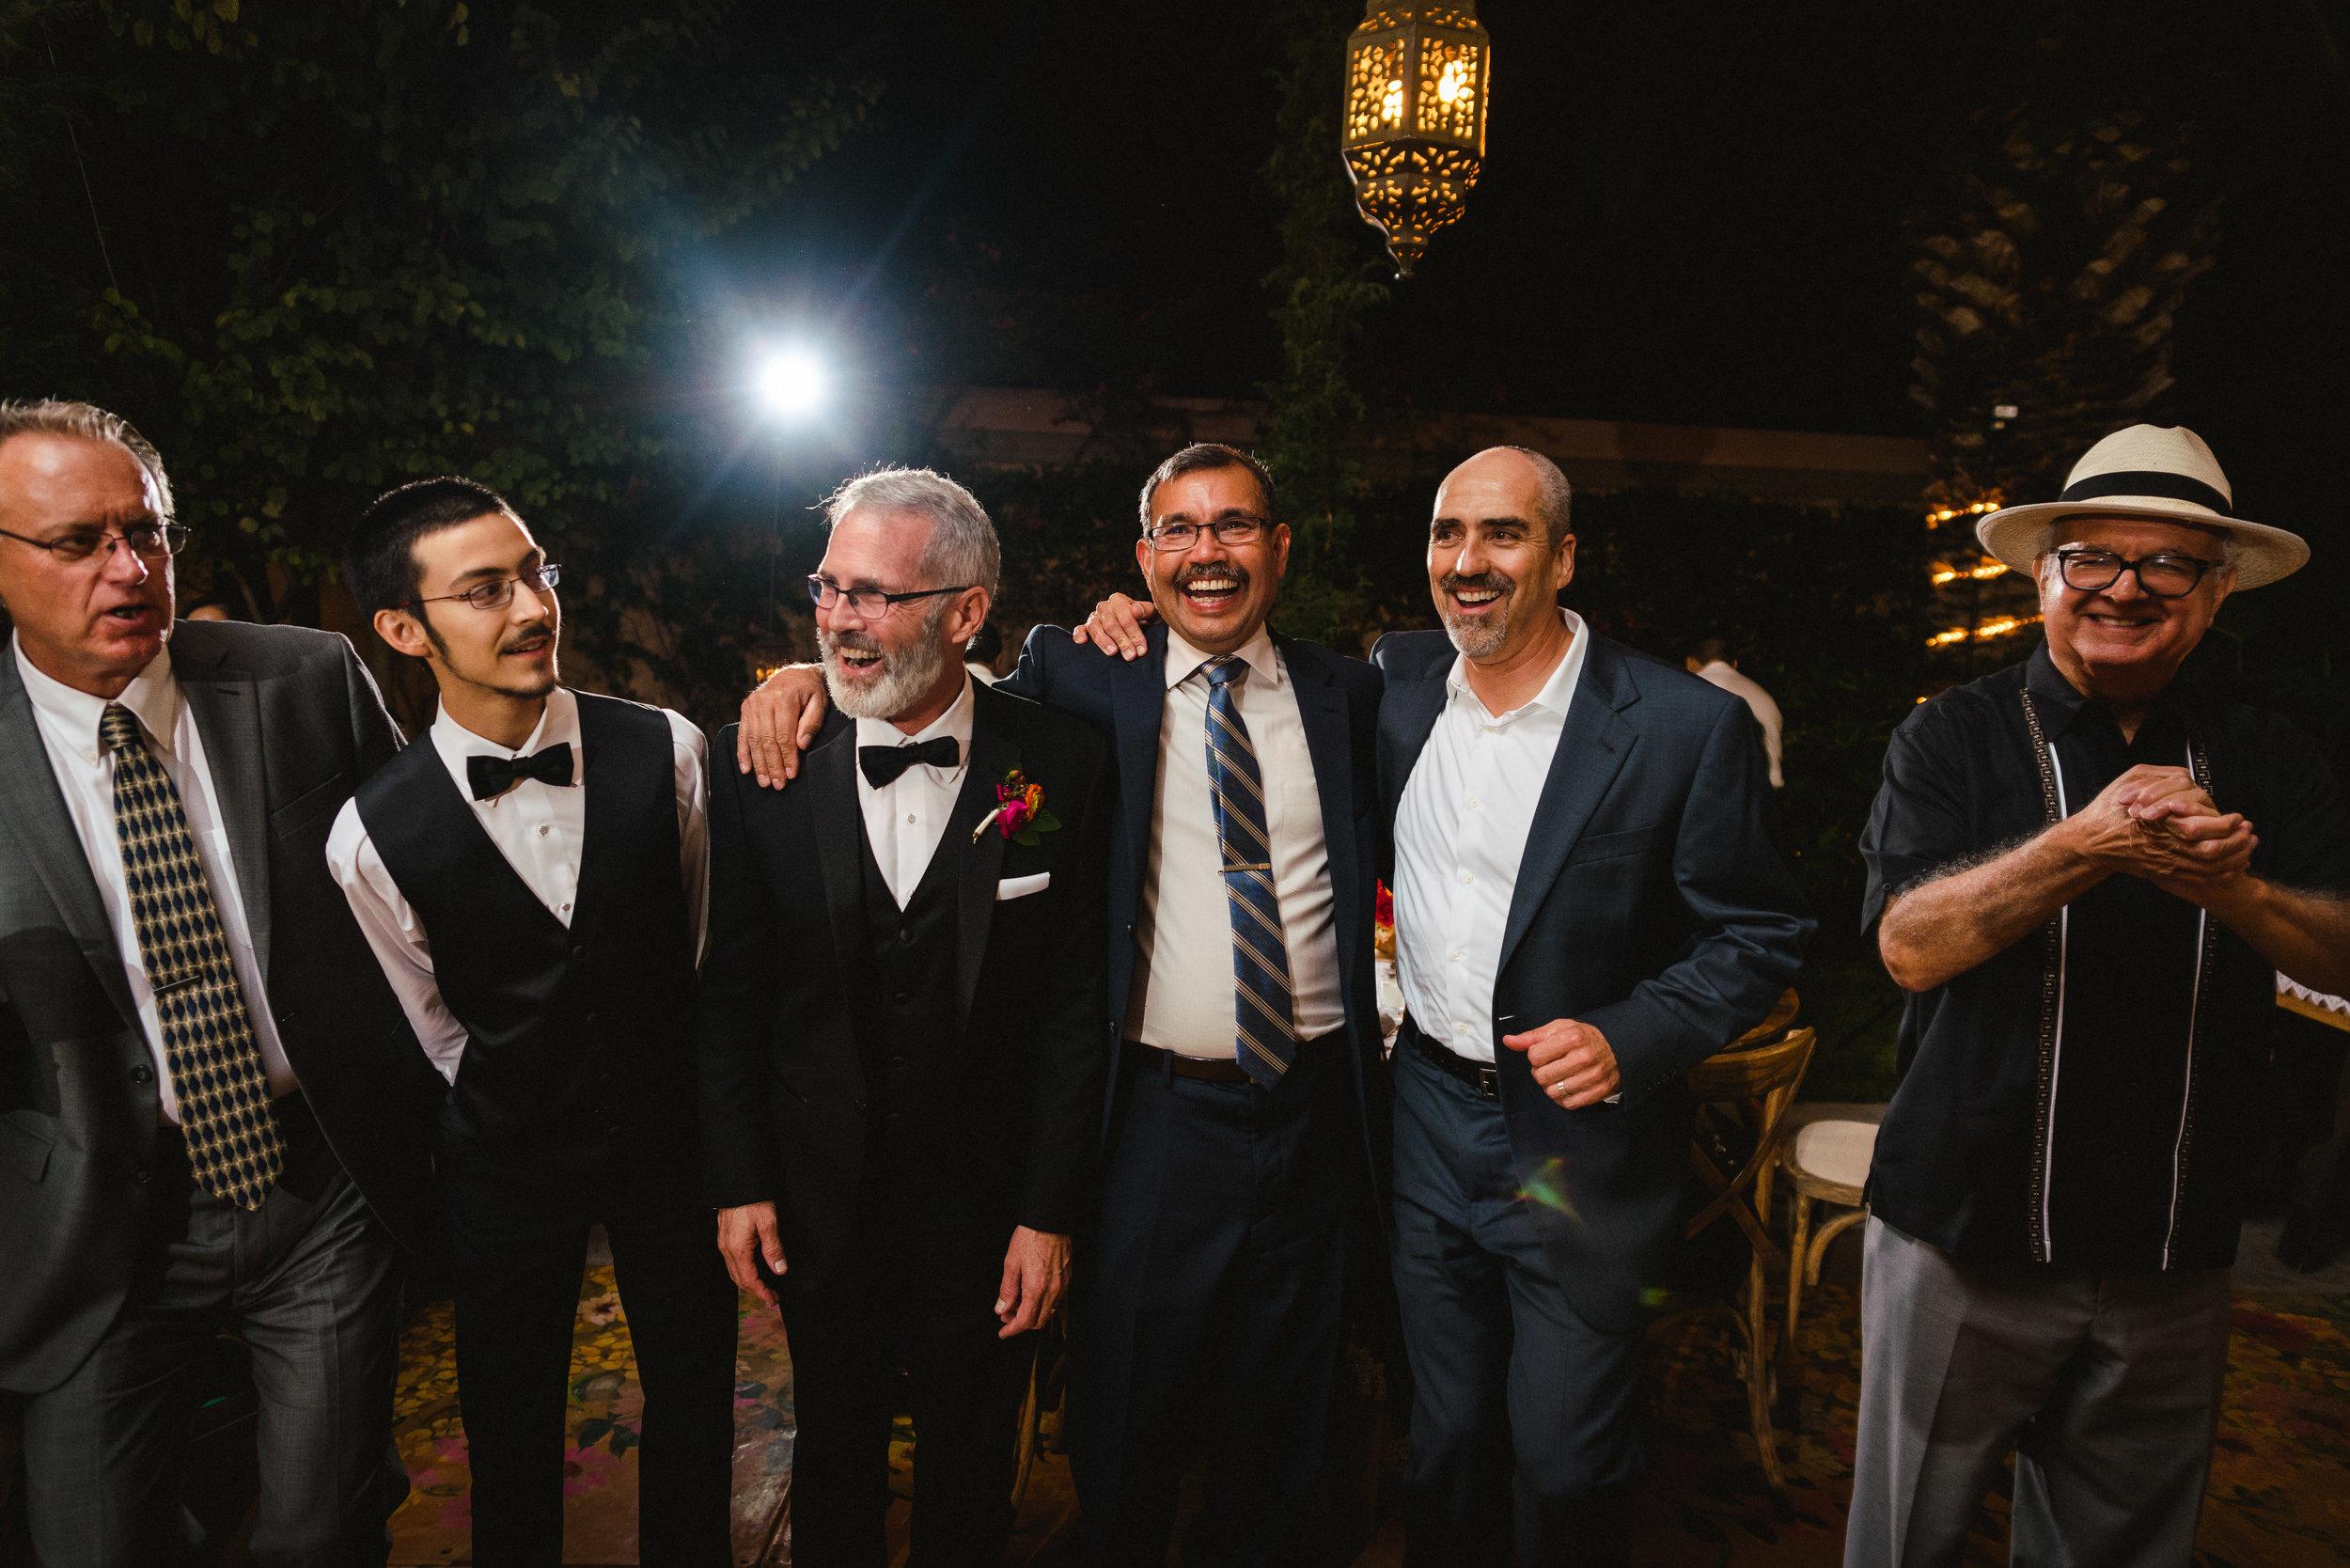 MaurizioSolisBroca-casa-carino-san-miguel-de-allende-wedding-94.jpg